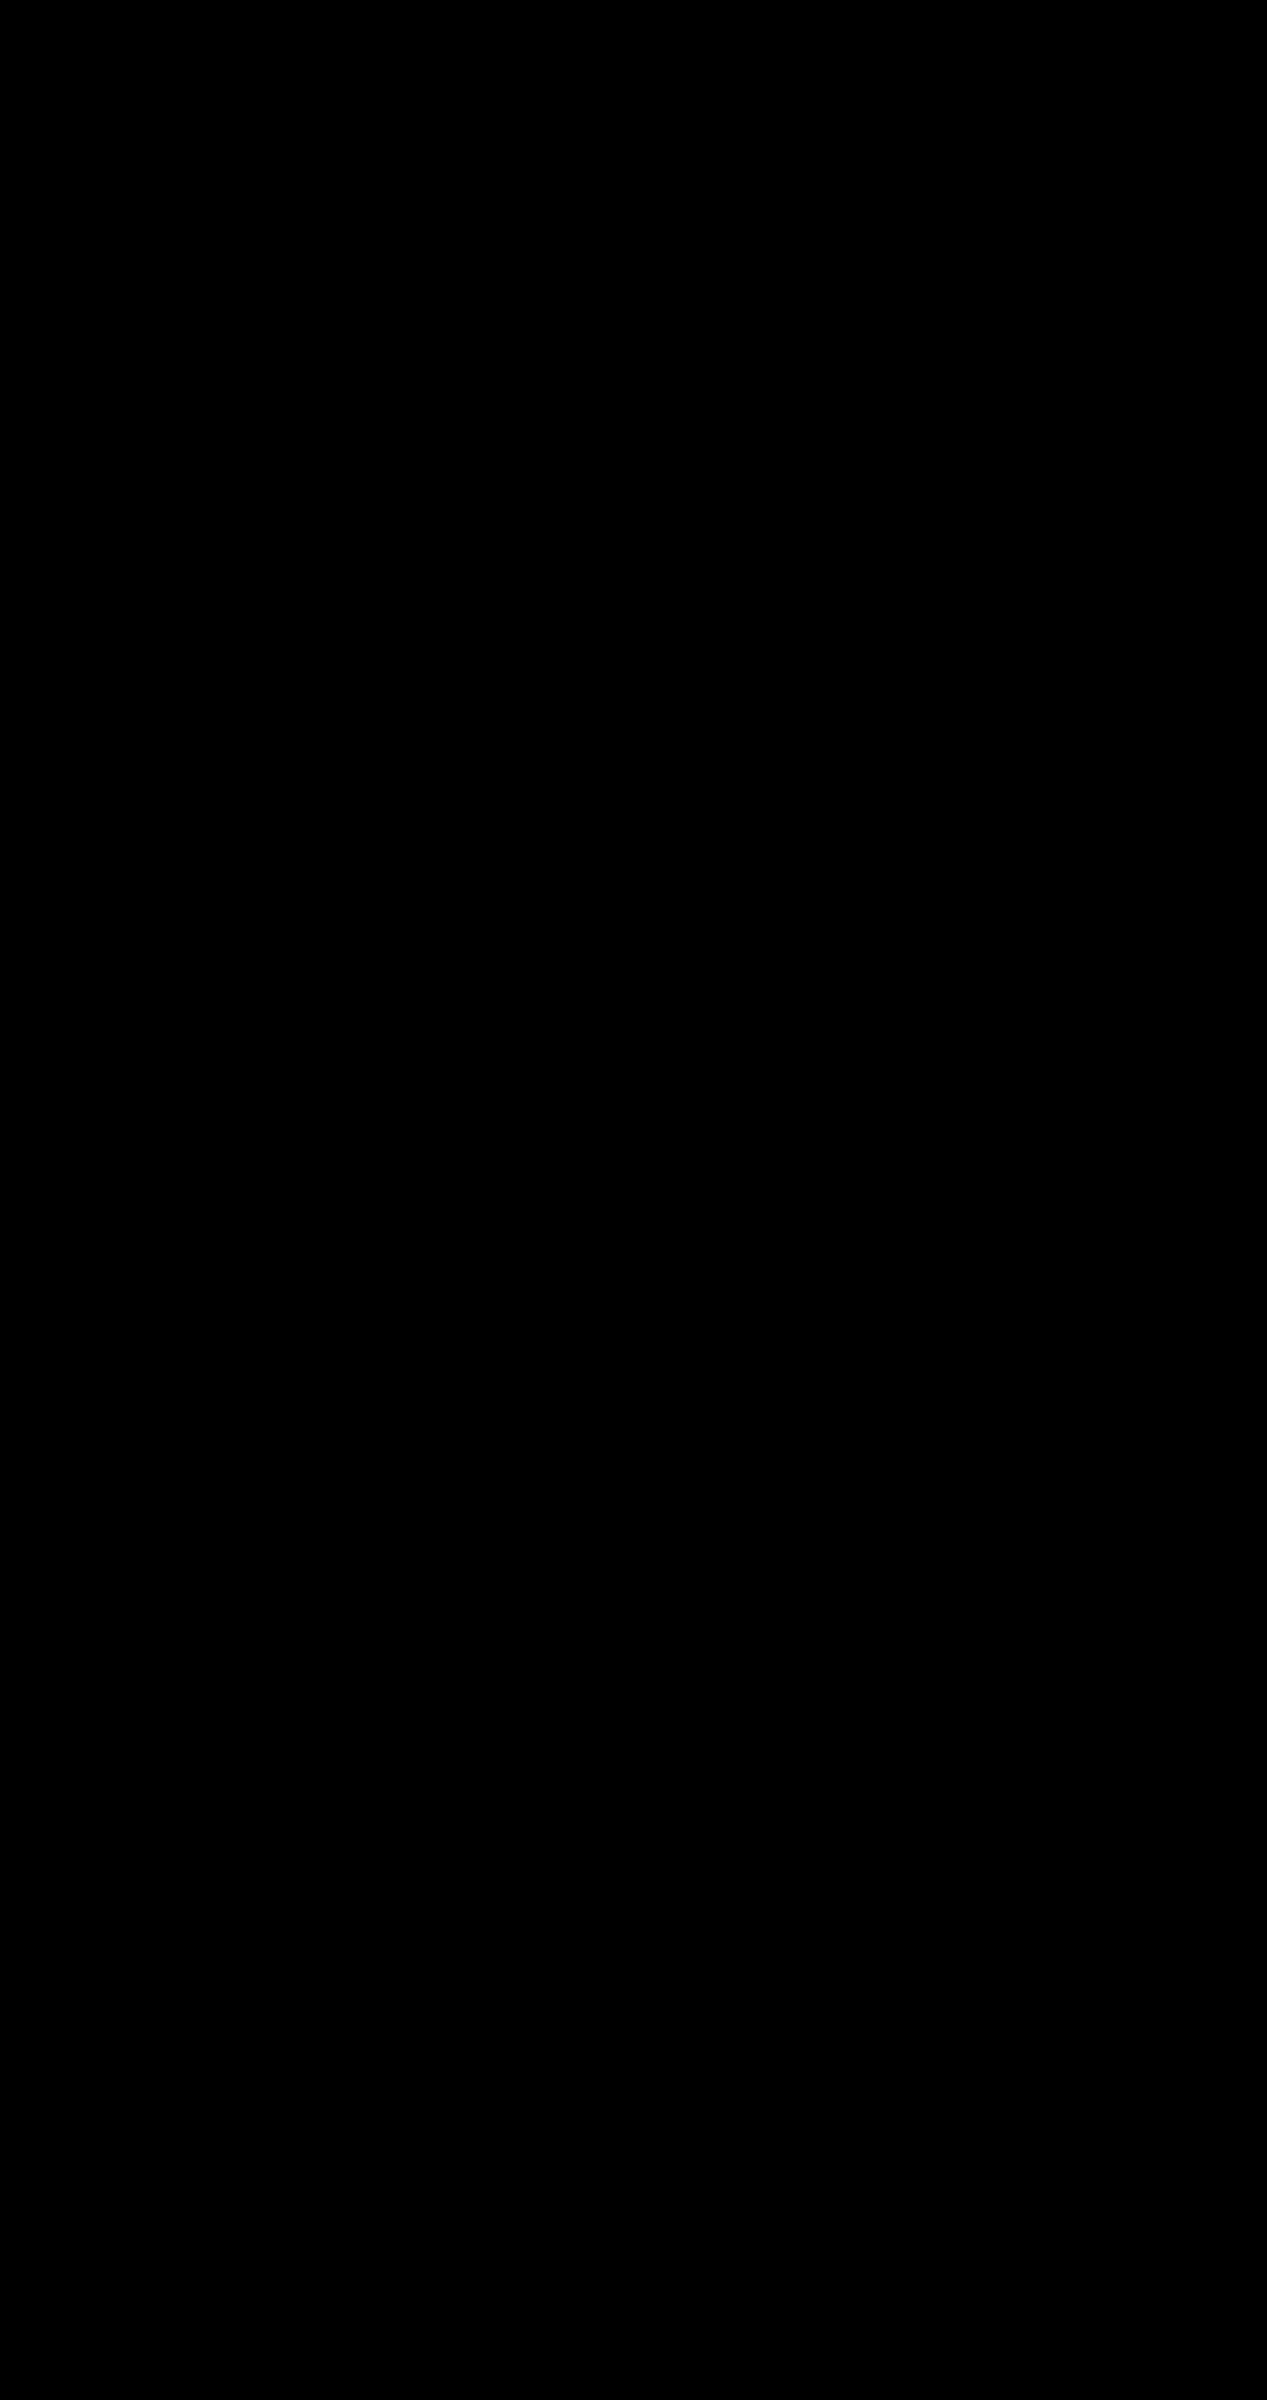 Clipart cfl big image. Light bulb clip art silhouette